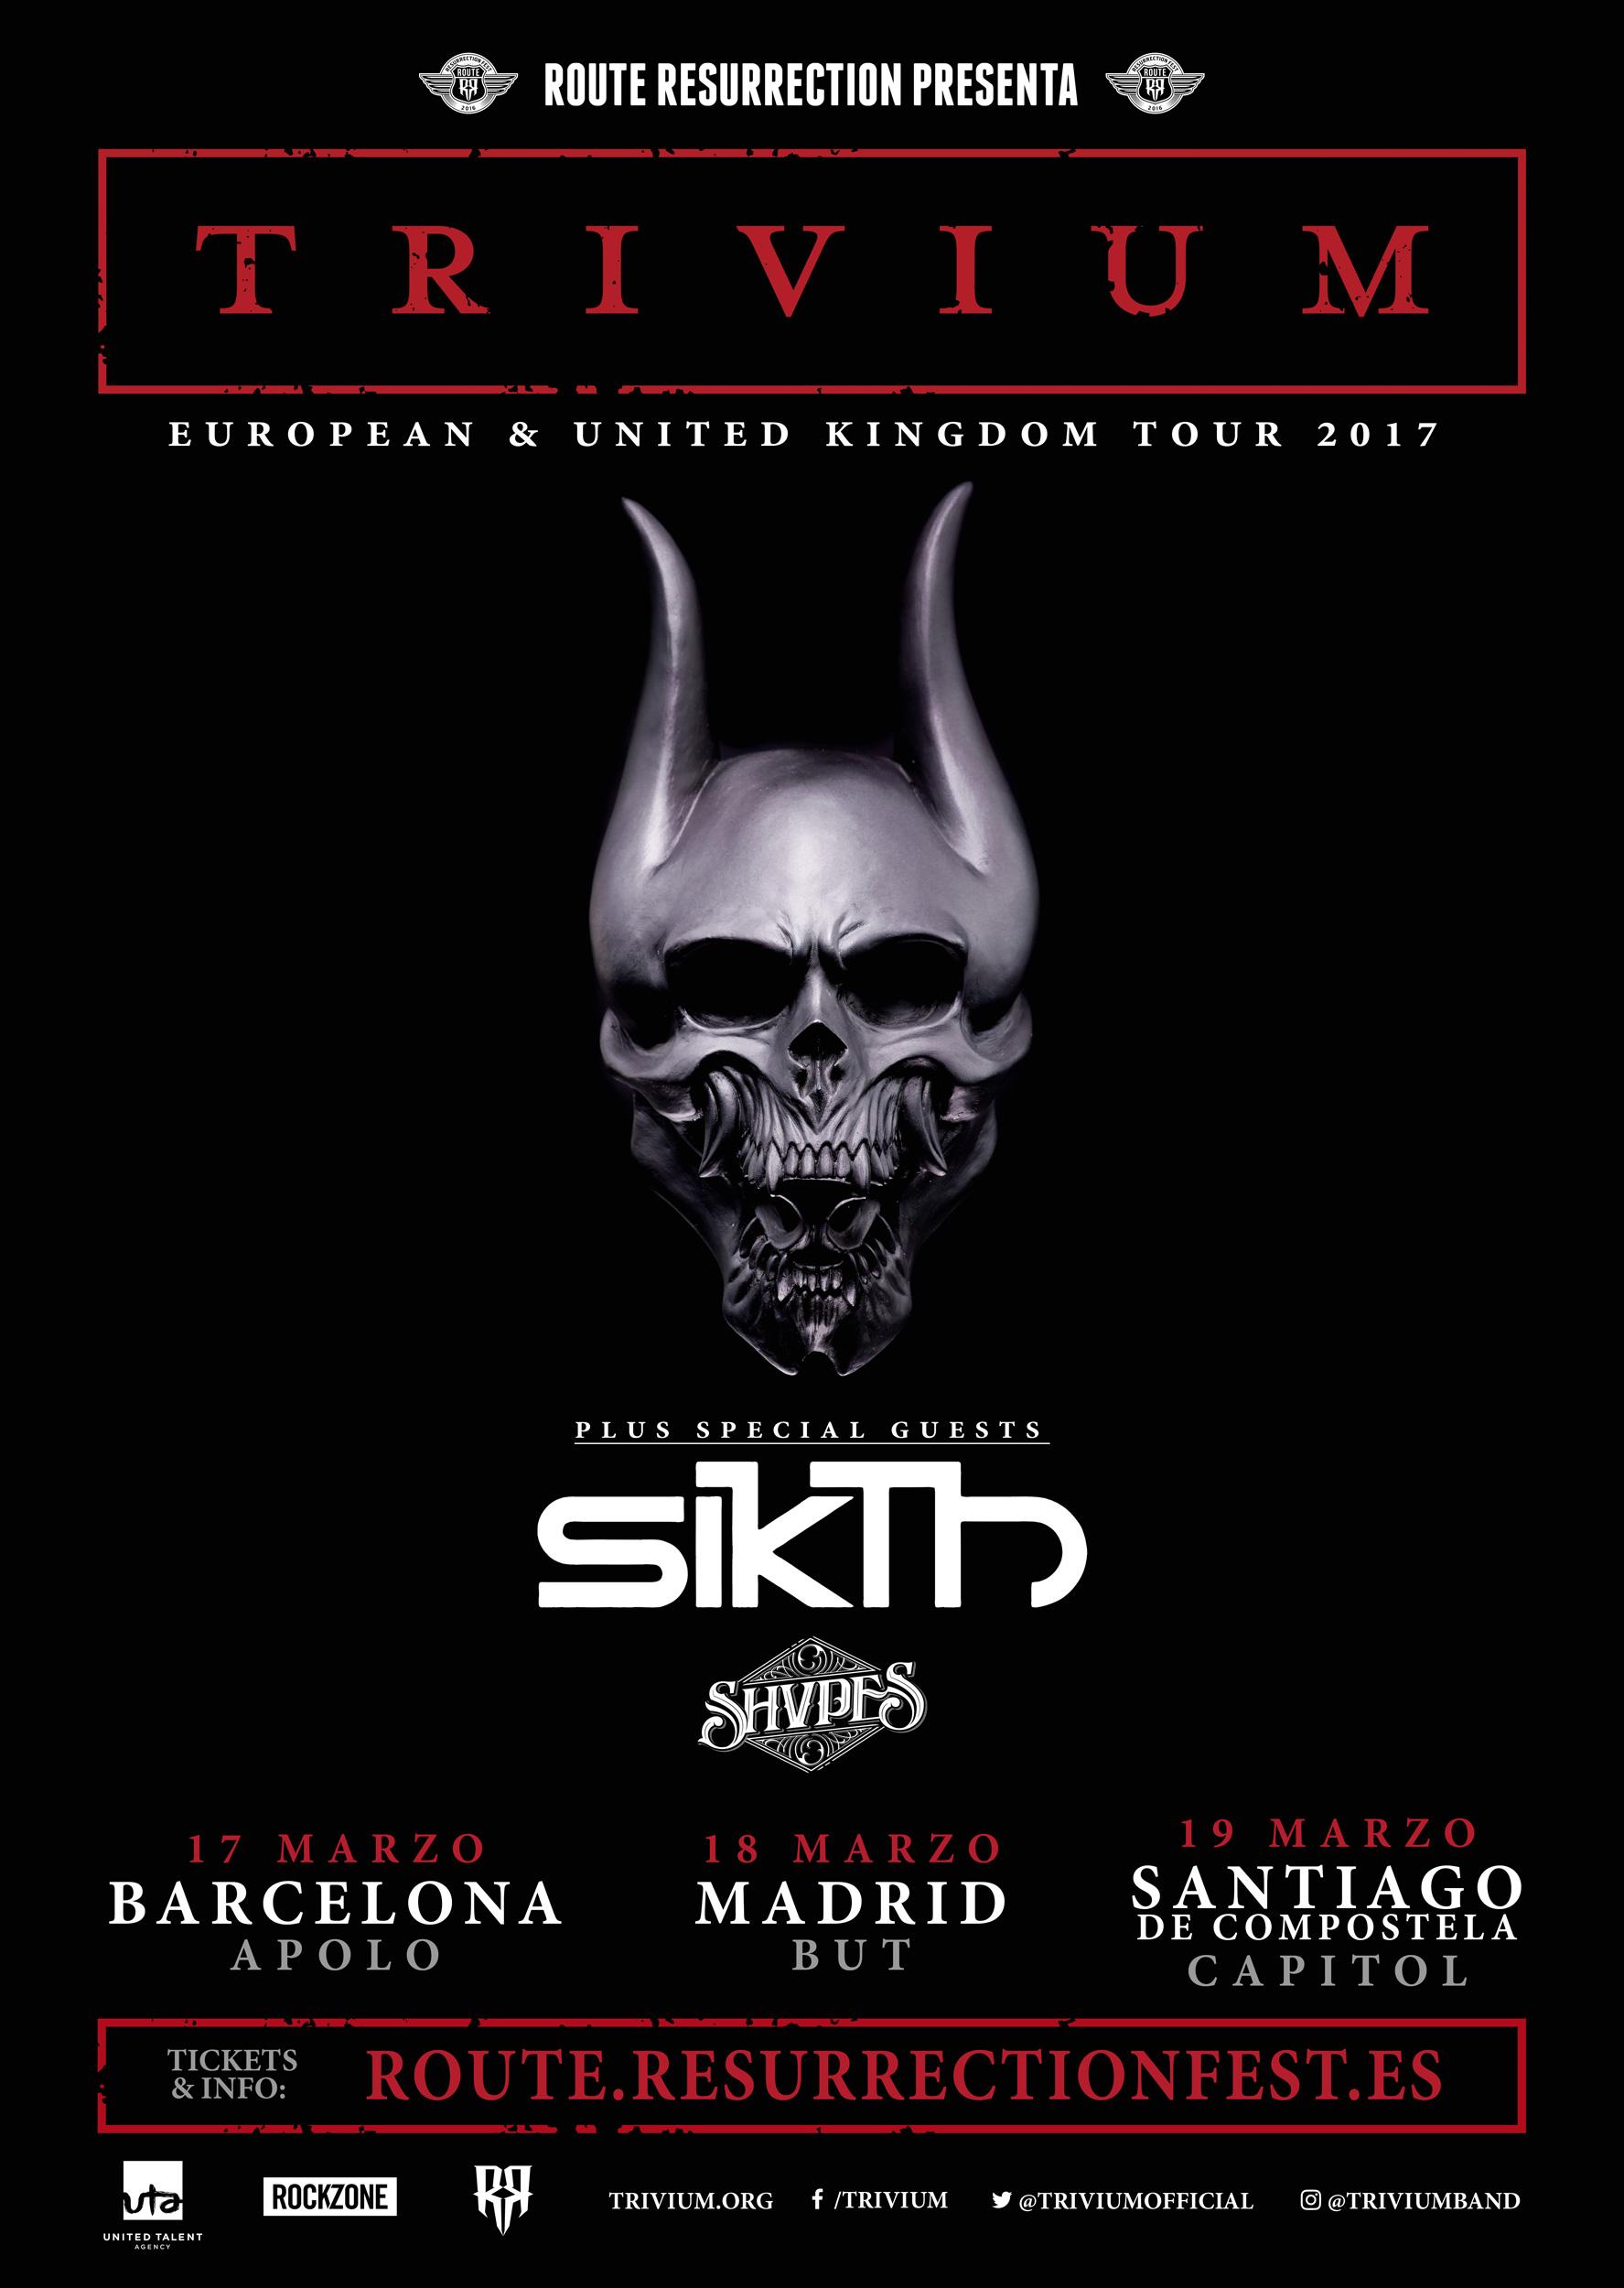 http://www.resurrectionfest.es/media/Trivium-poster-A2-negro-v1-web.jpg